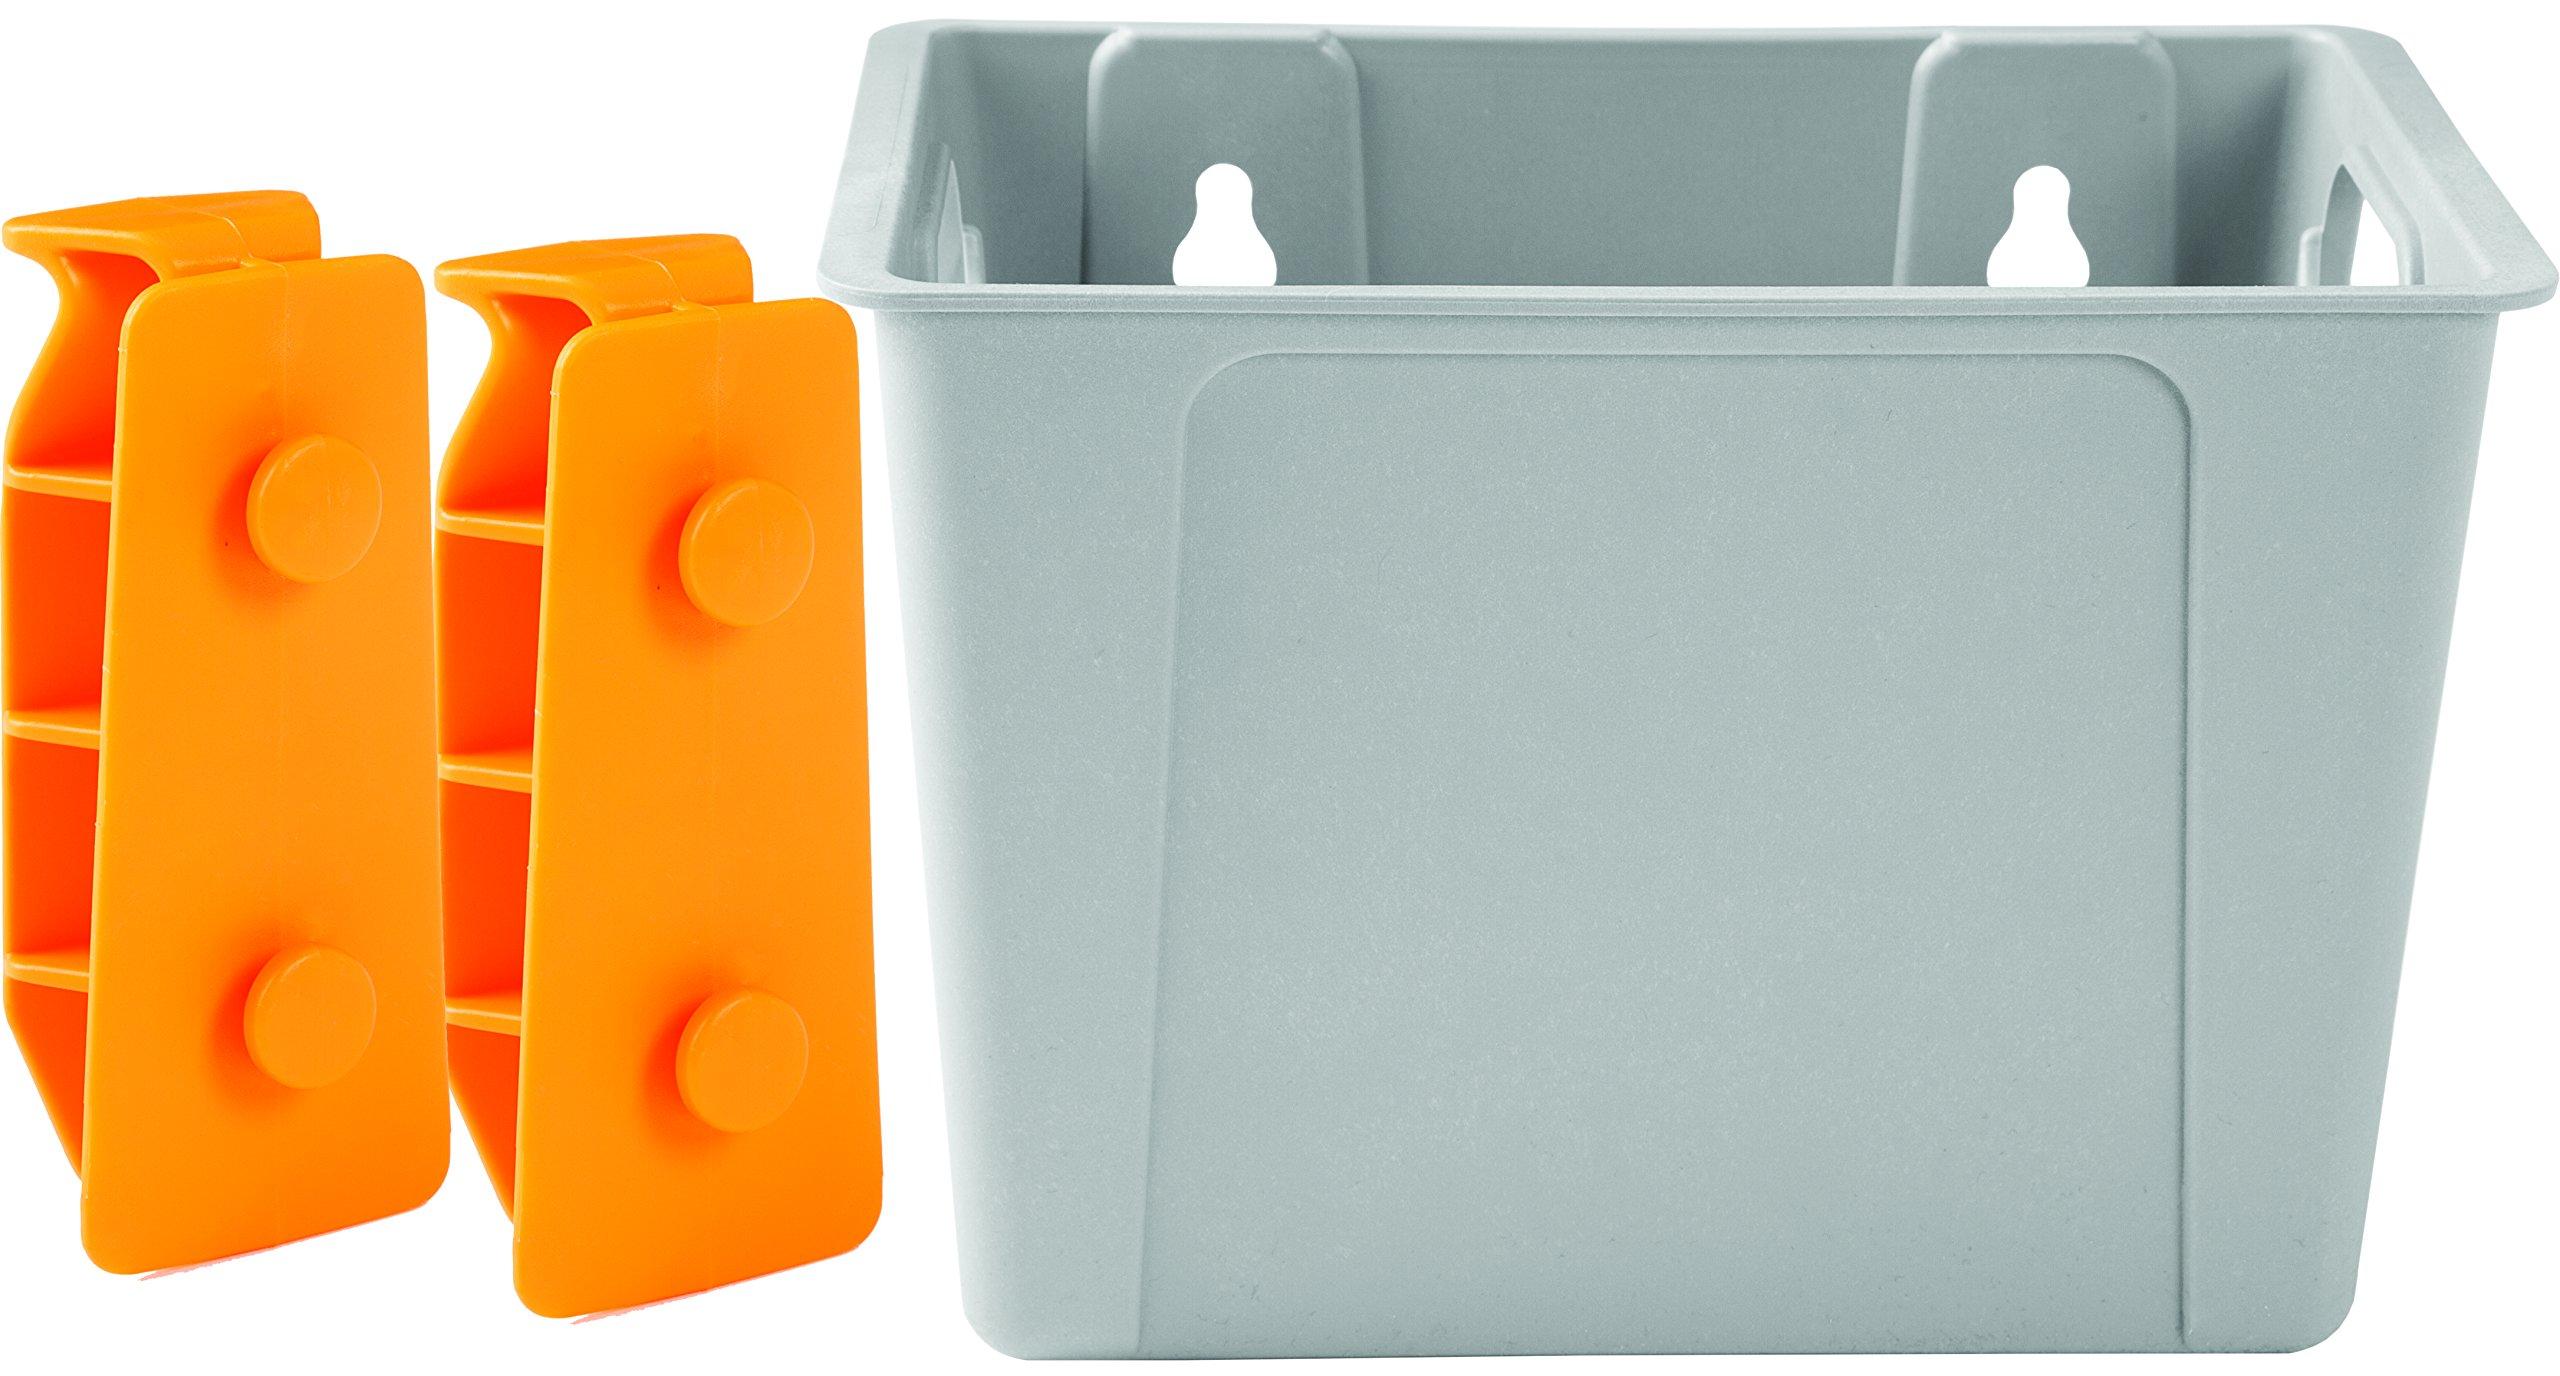 Lock & Roll Organizer Small Storage Bin